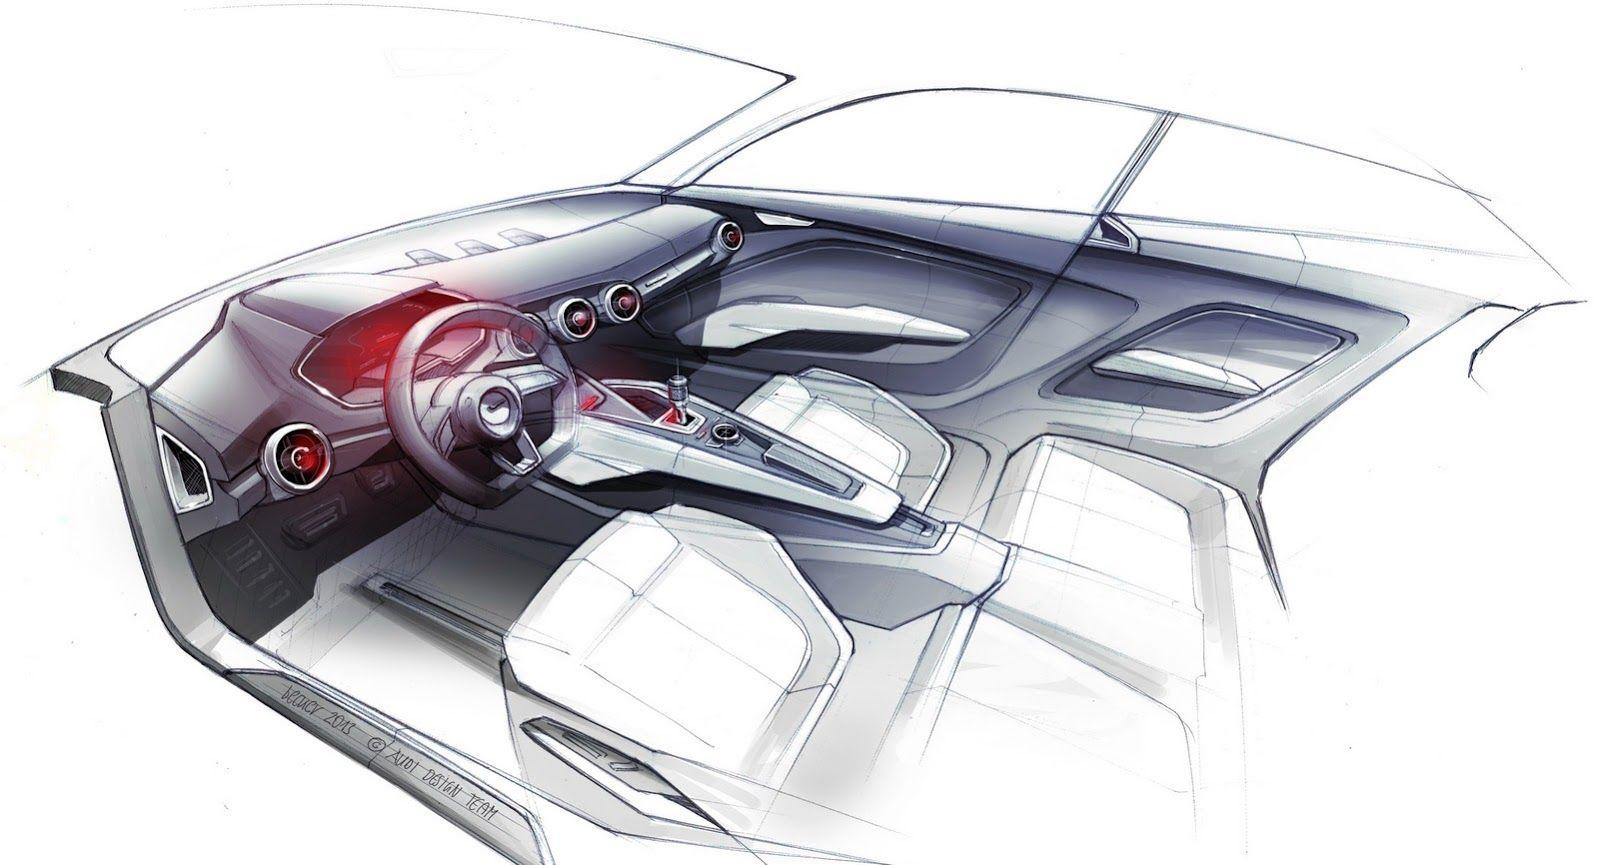 Audi Q8 Tail Light Design Sketch | Led light design